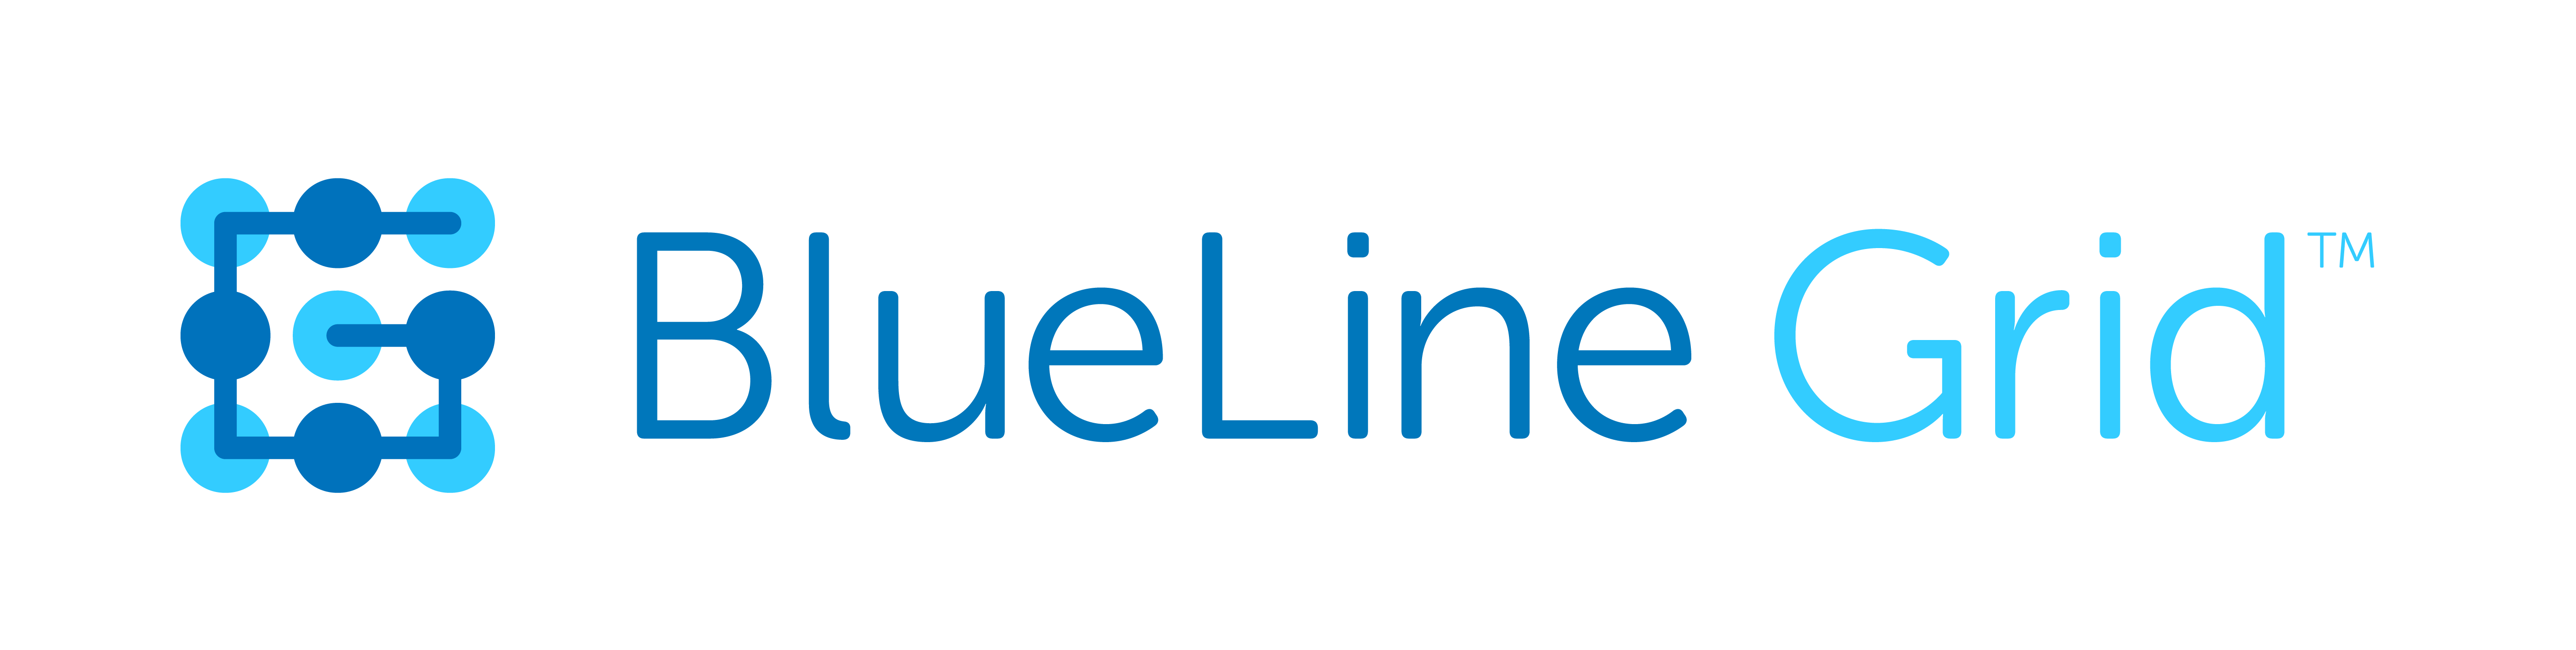 BlueLine Grid company logo